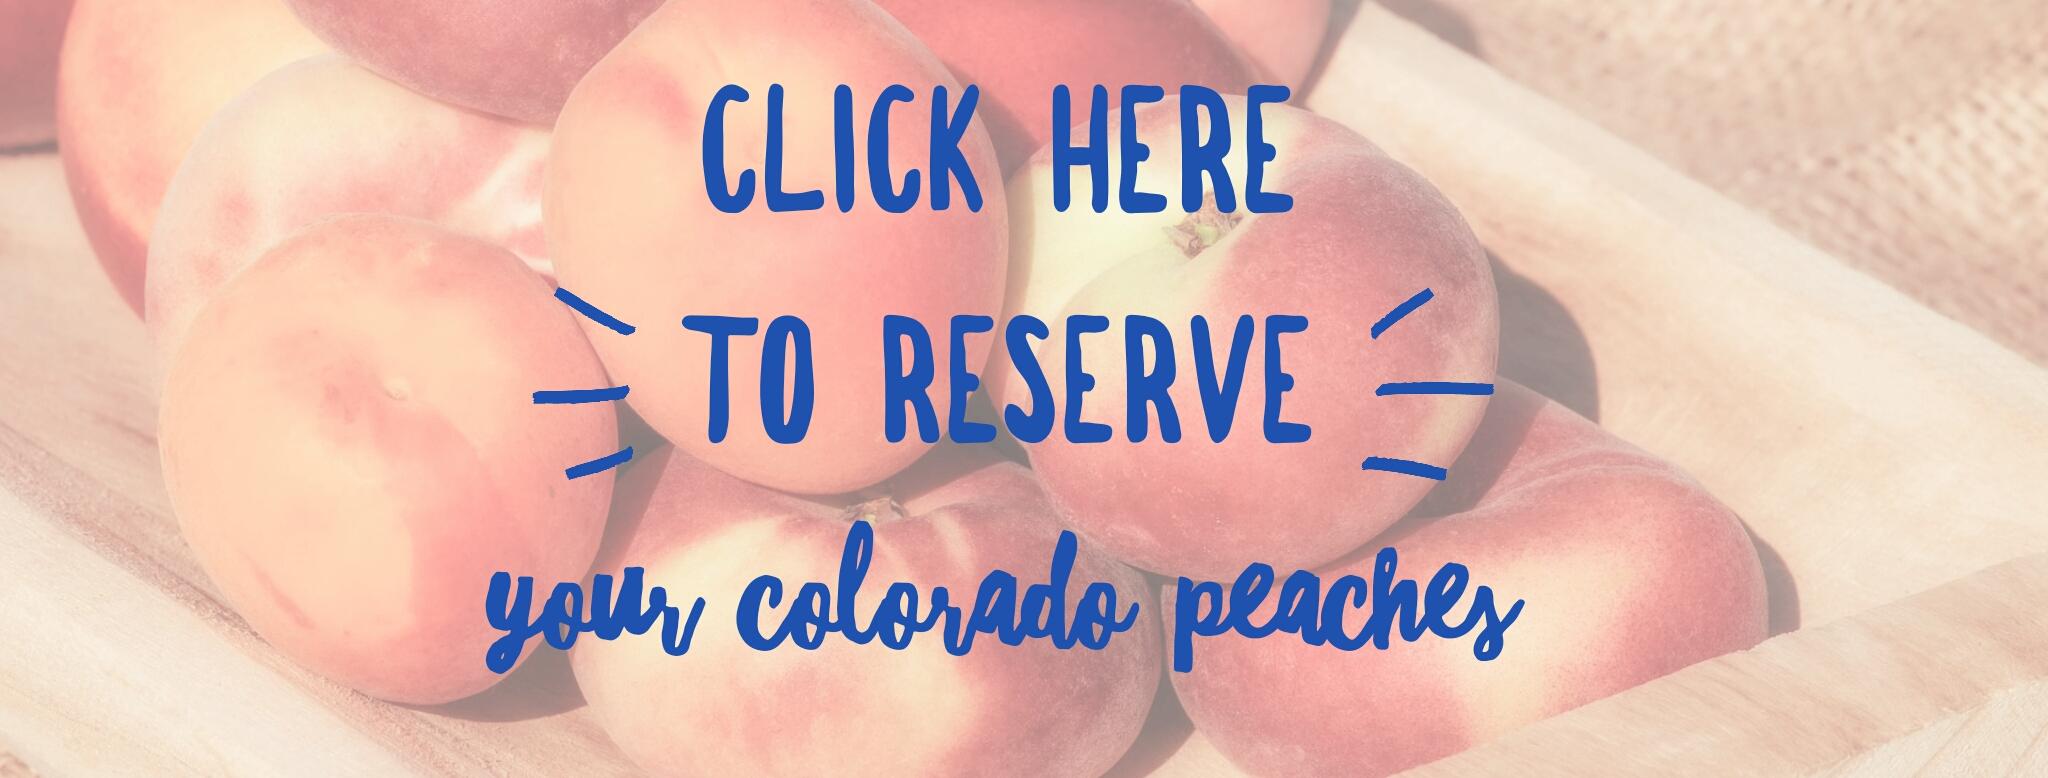 peaches 2019 cover